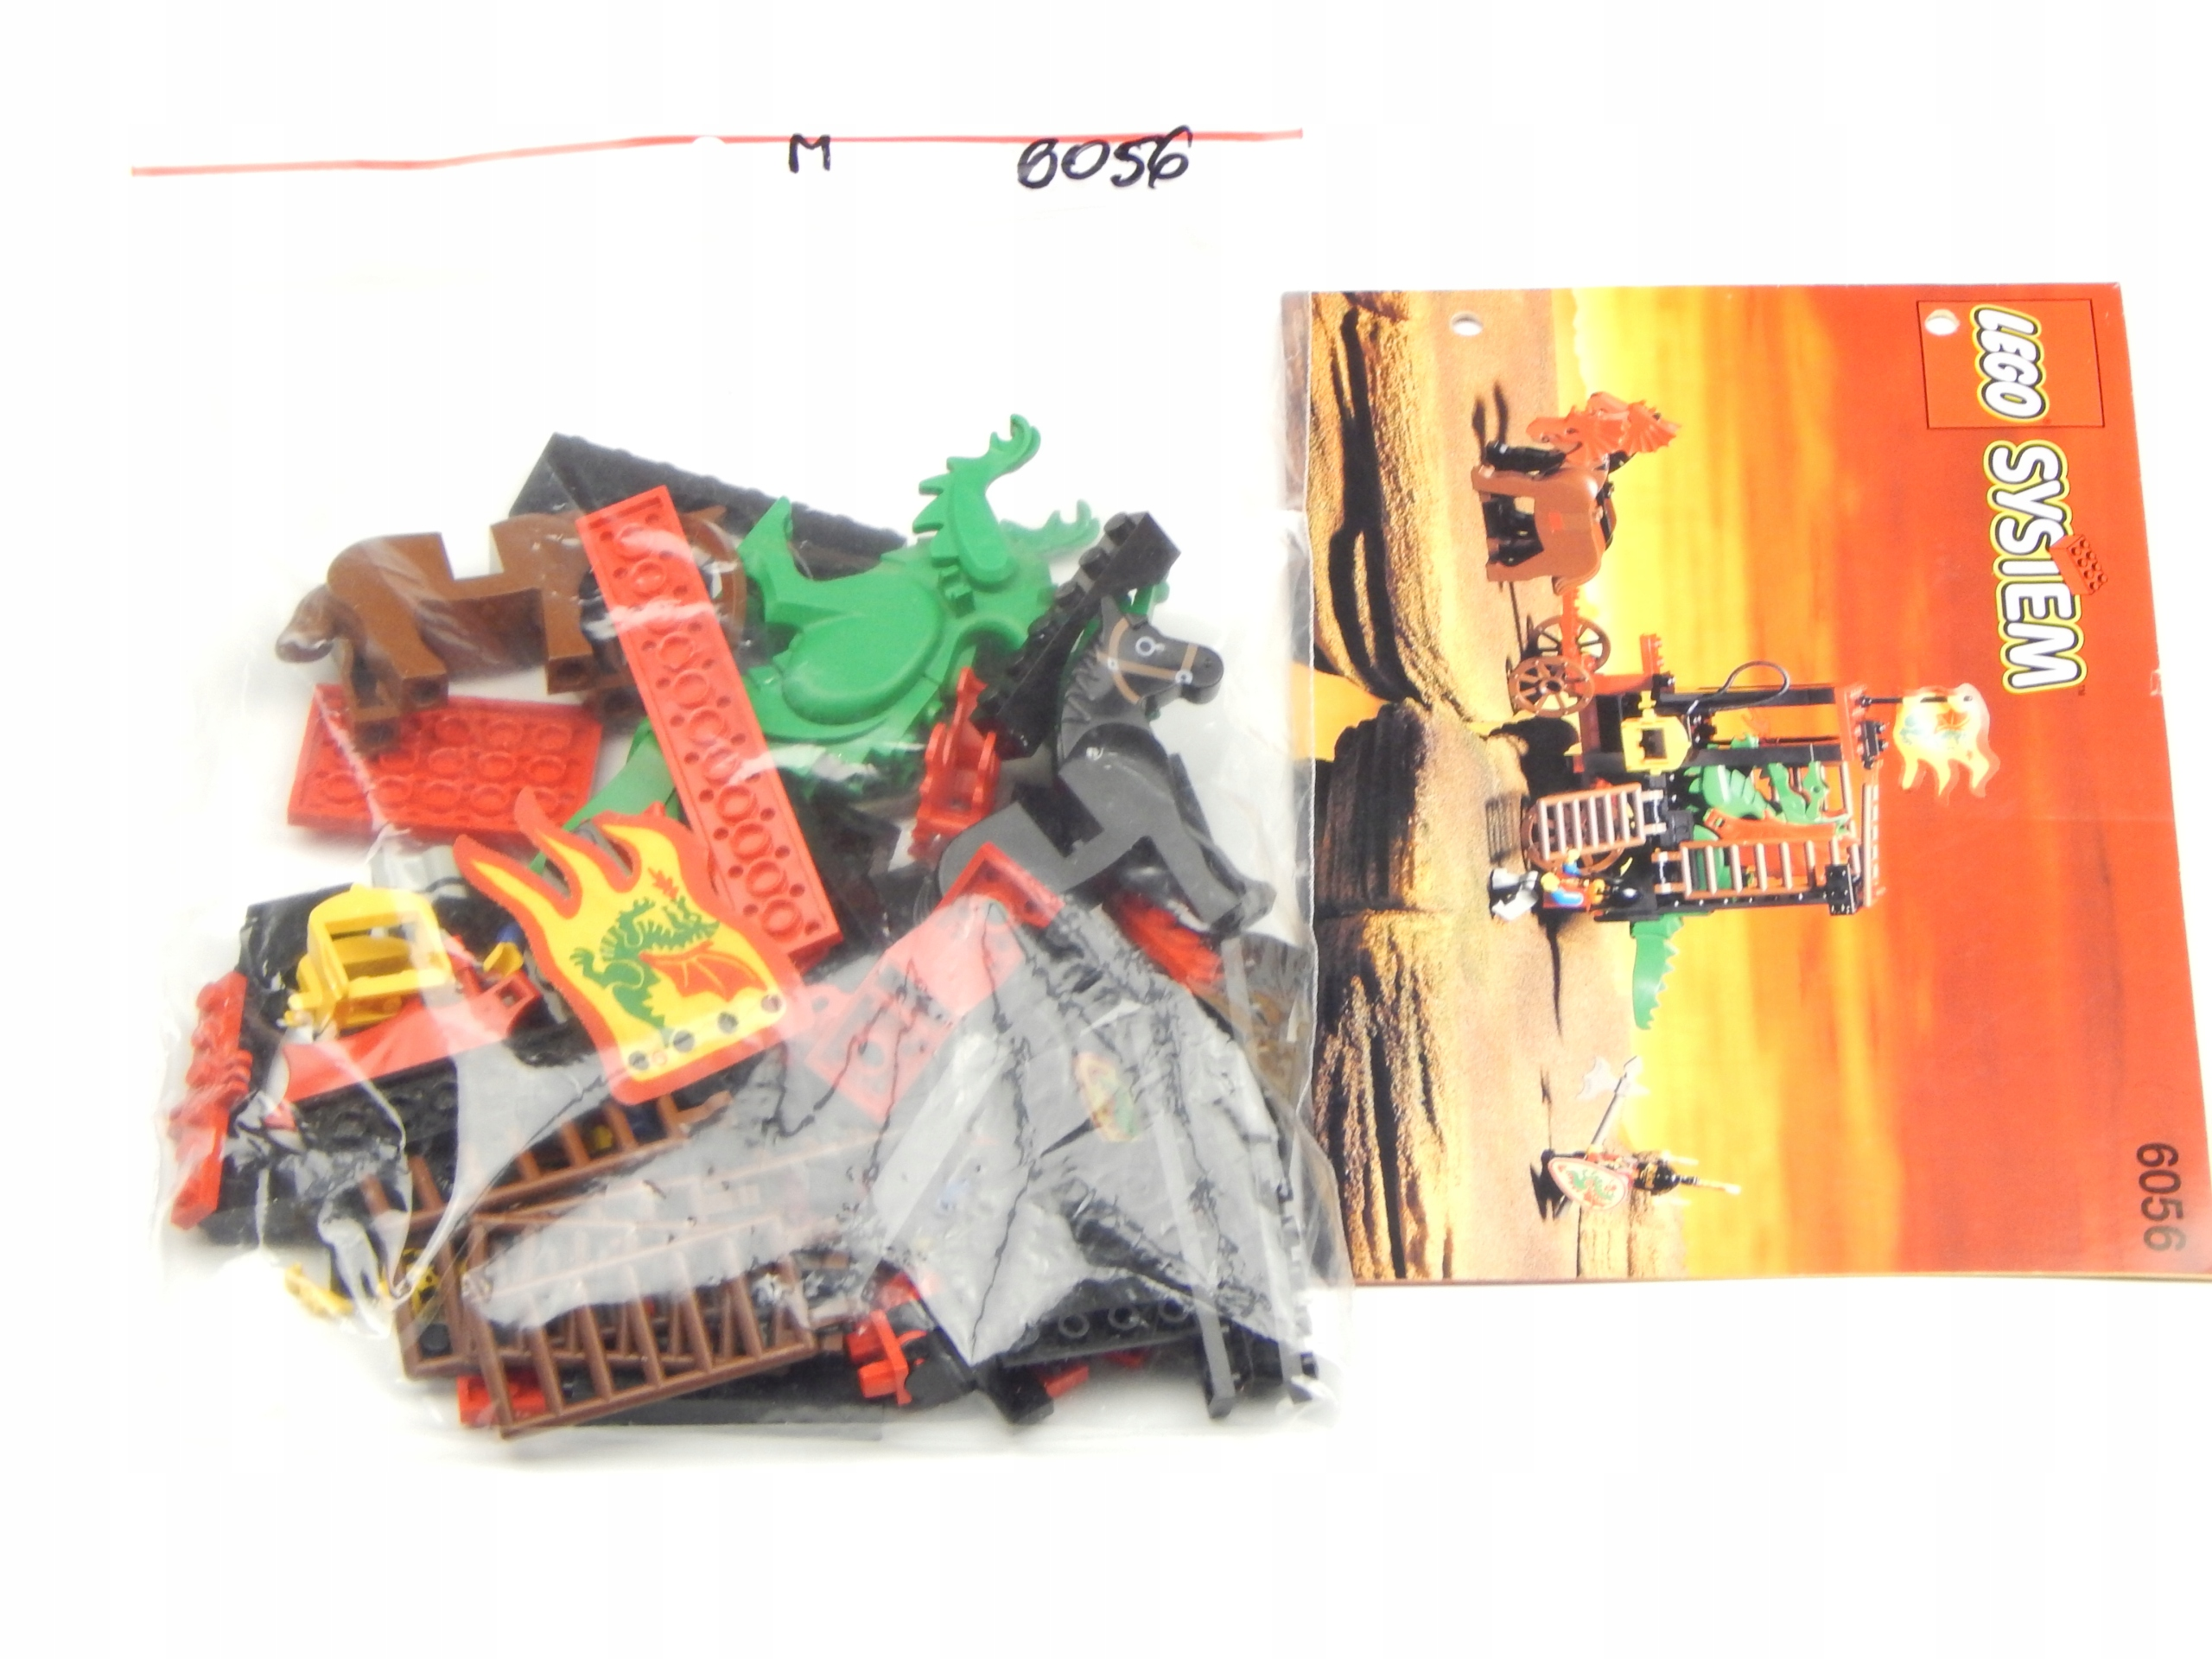 LEGO SET 6056 CASTLE INSTRUKCJA UNIKAT SUPER STAN